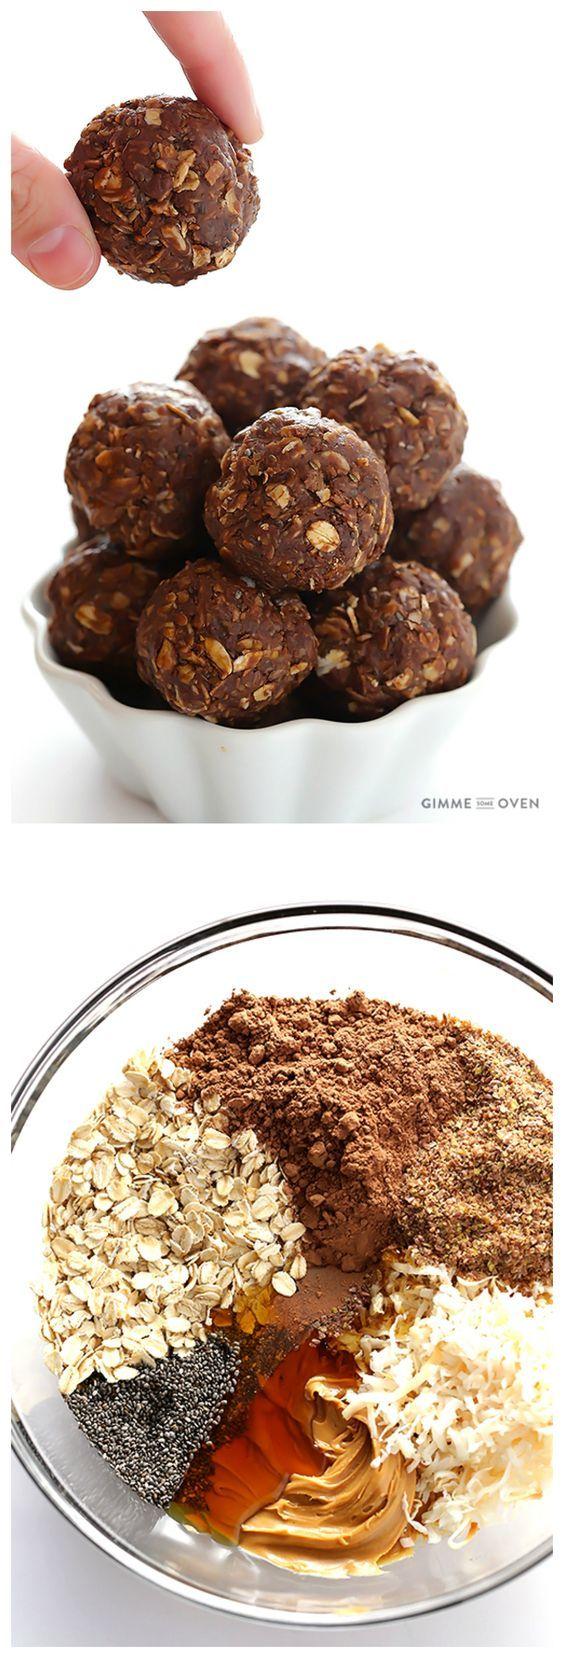 Chocolate Peanut Butter No-Bake Energy Bites